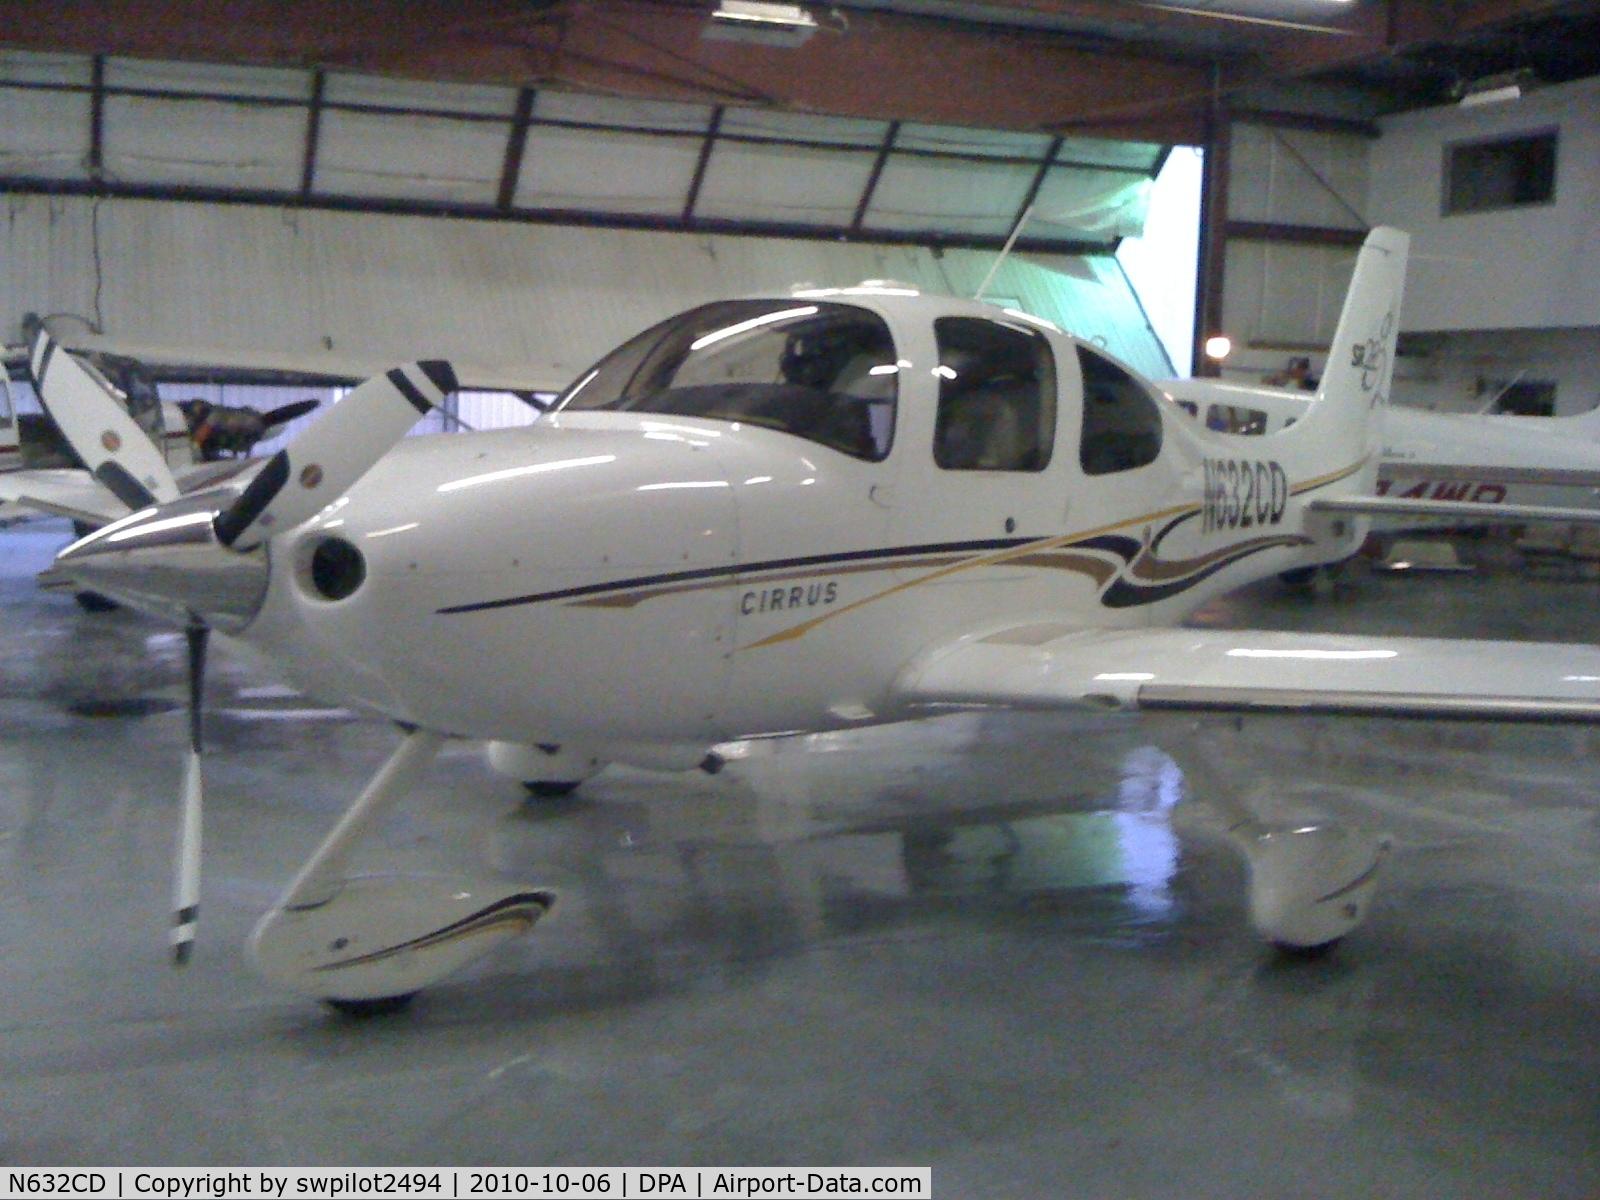 N632CD, 2005 Cirrus SR22 G2 C/N 1641, Cirrus SR-22